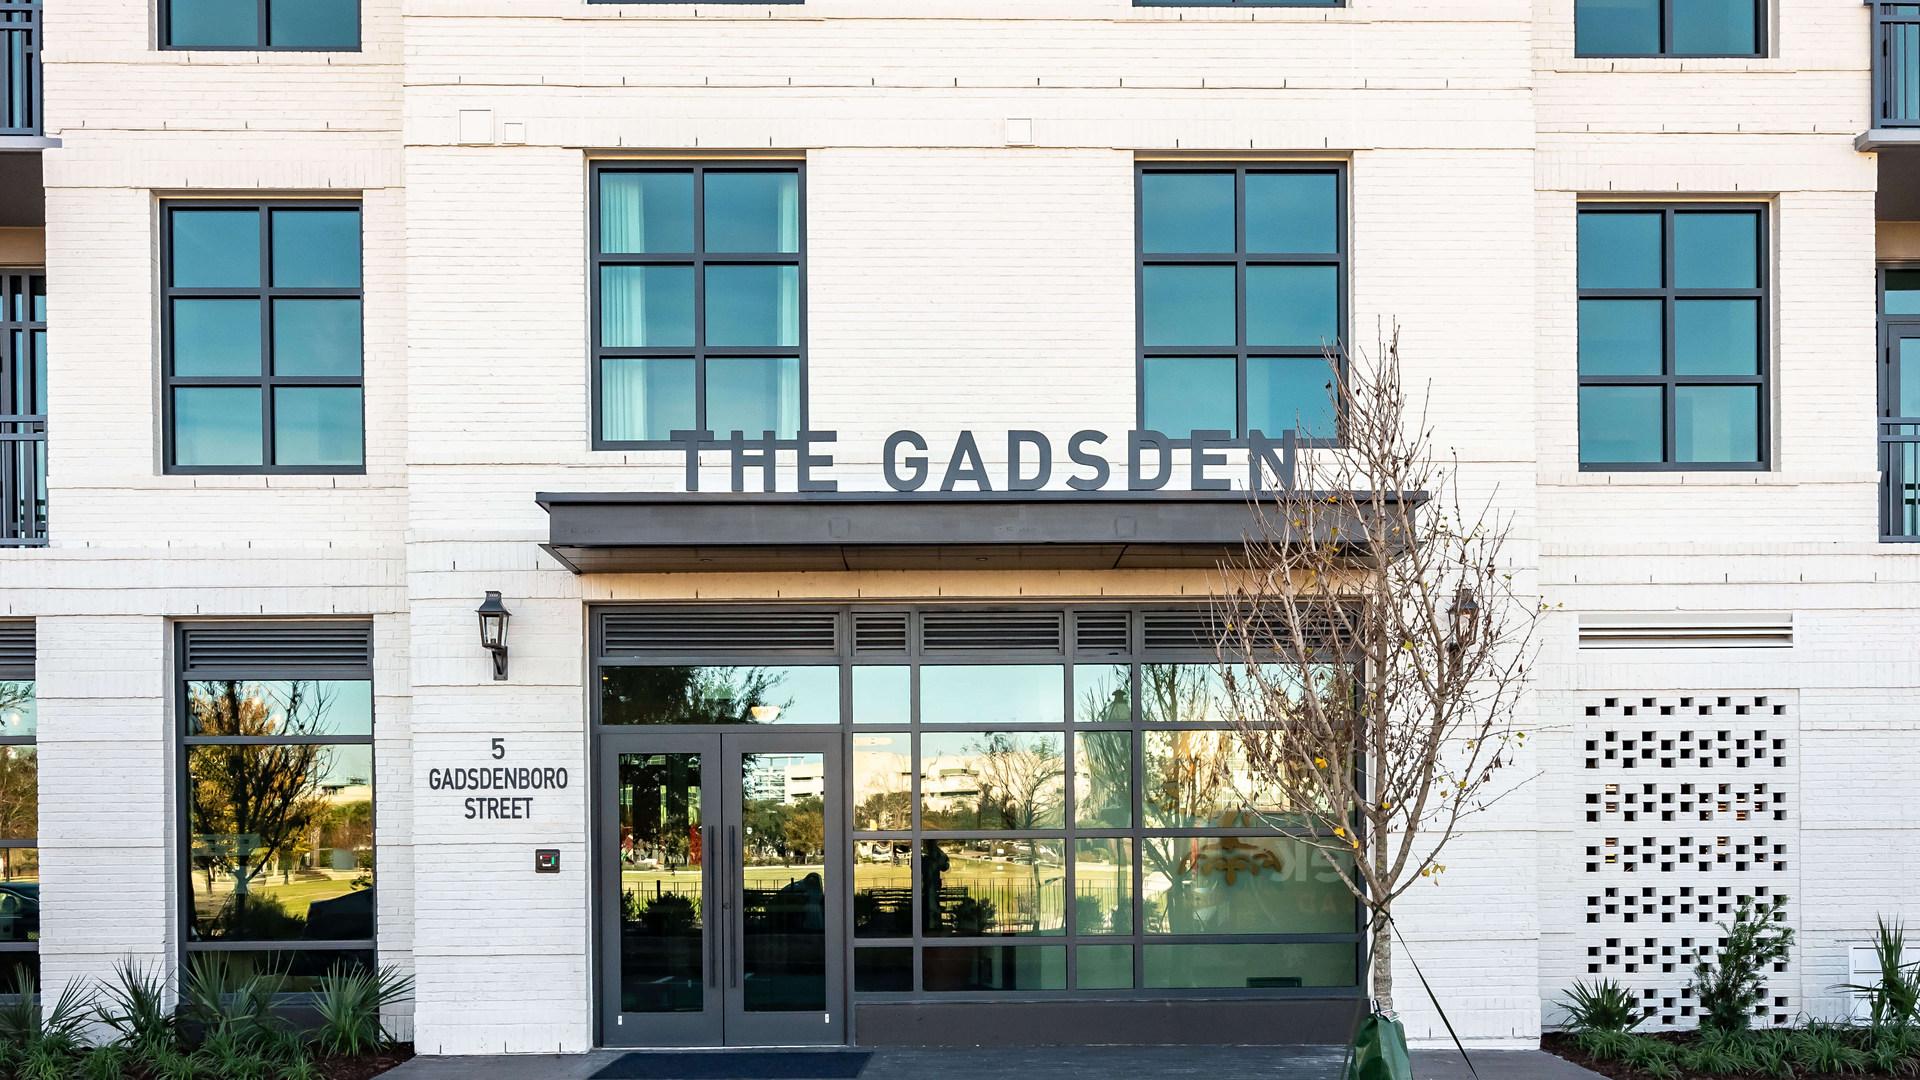 THE GADSDEN